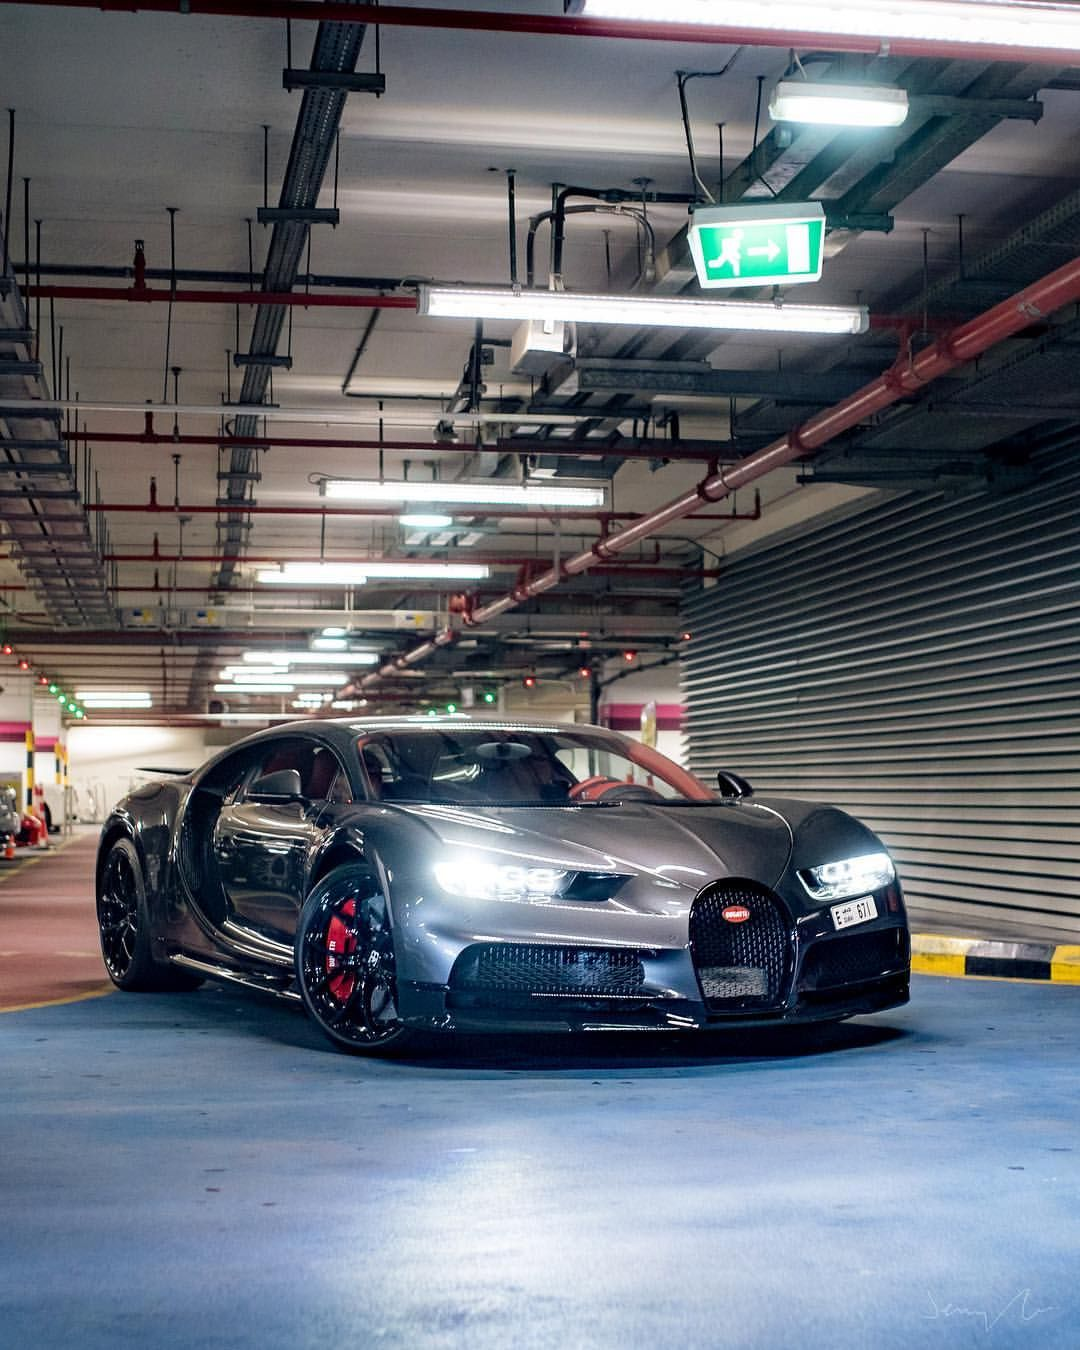 Parking Lot Finds In Dubai Bugatti Chiron Strongspec Ownerwasapricktho Bugatti Chiron Super Cars Abandoned Cars In Dubai